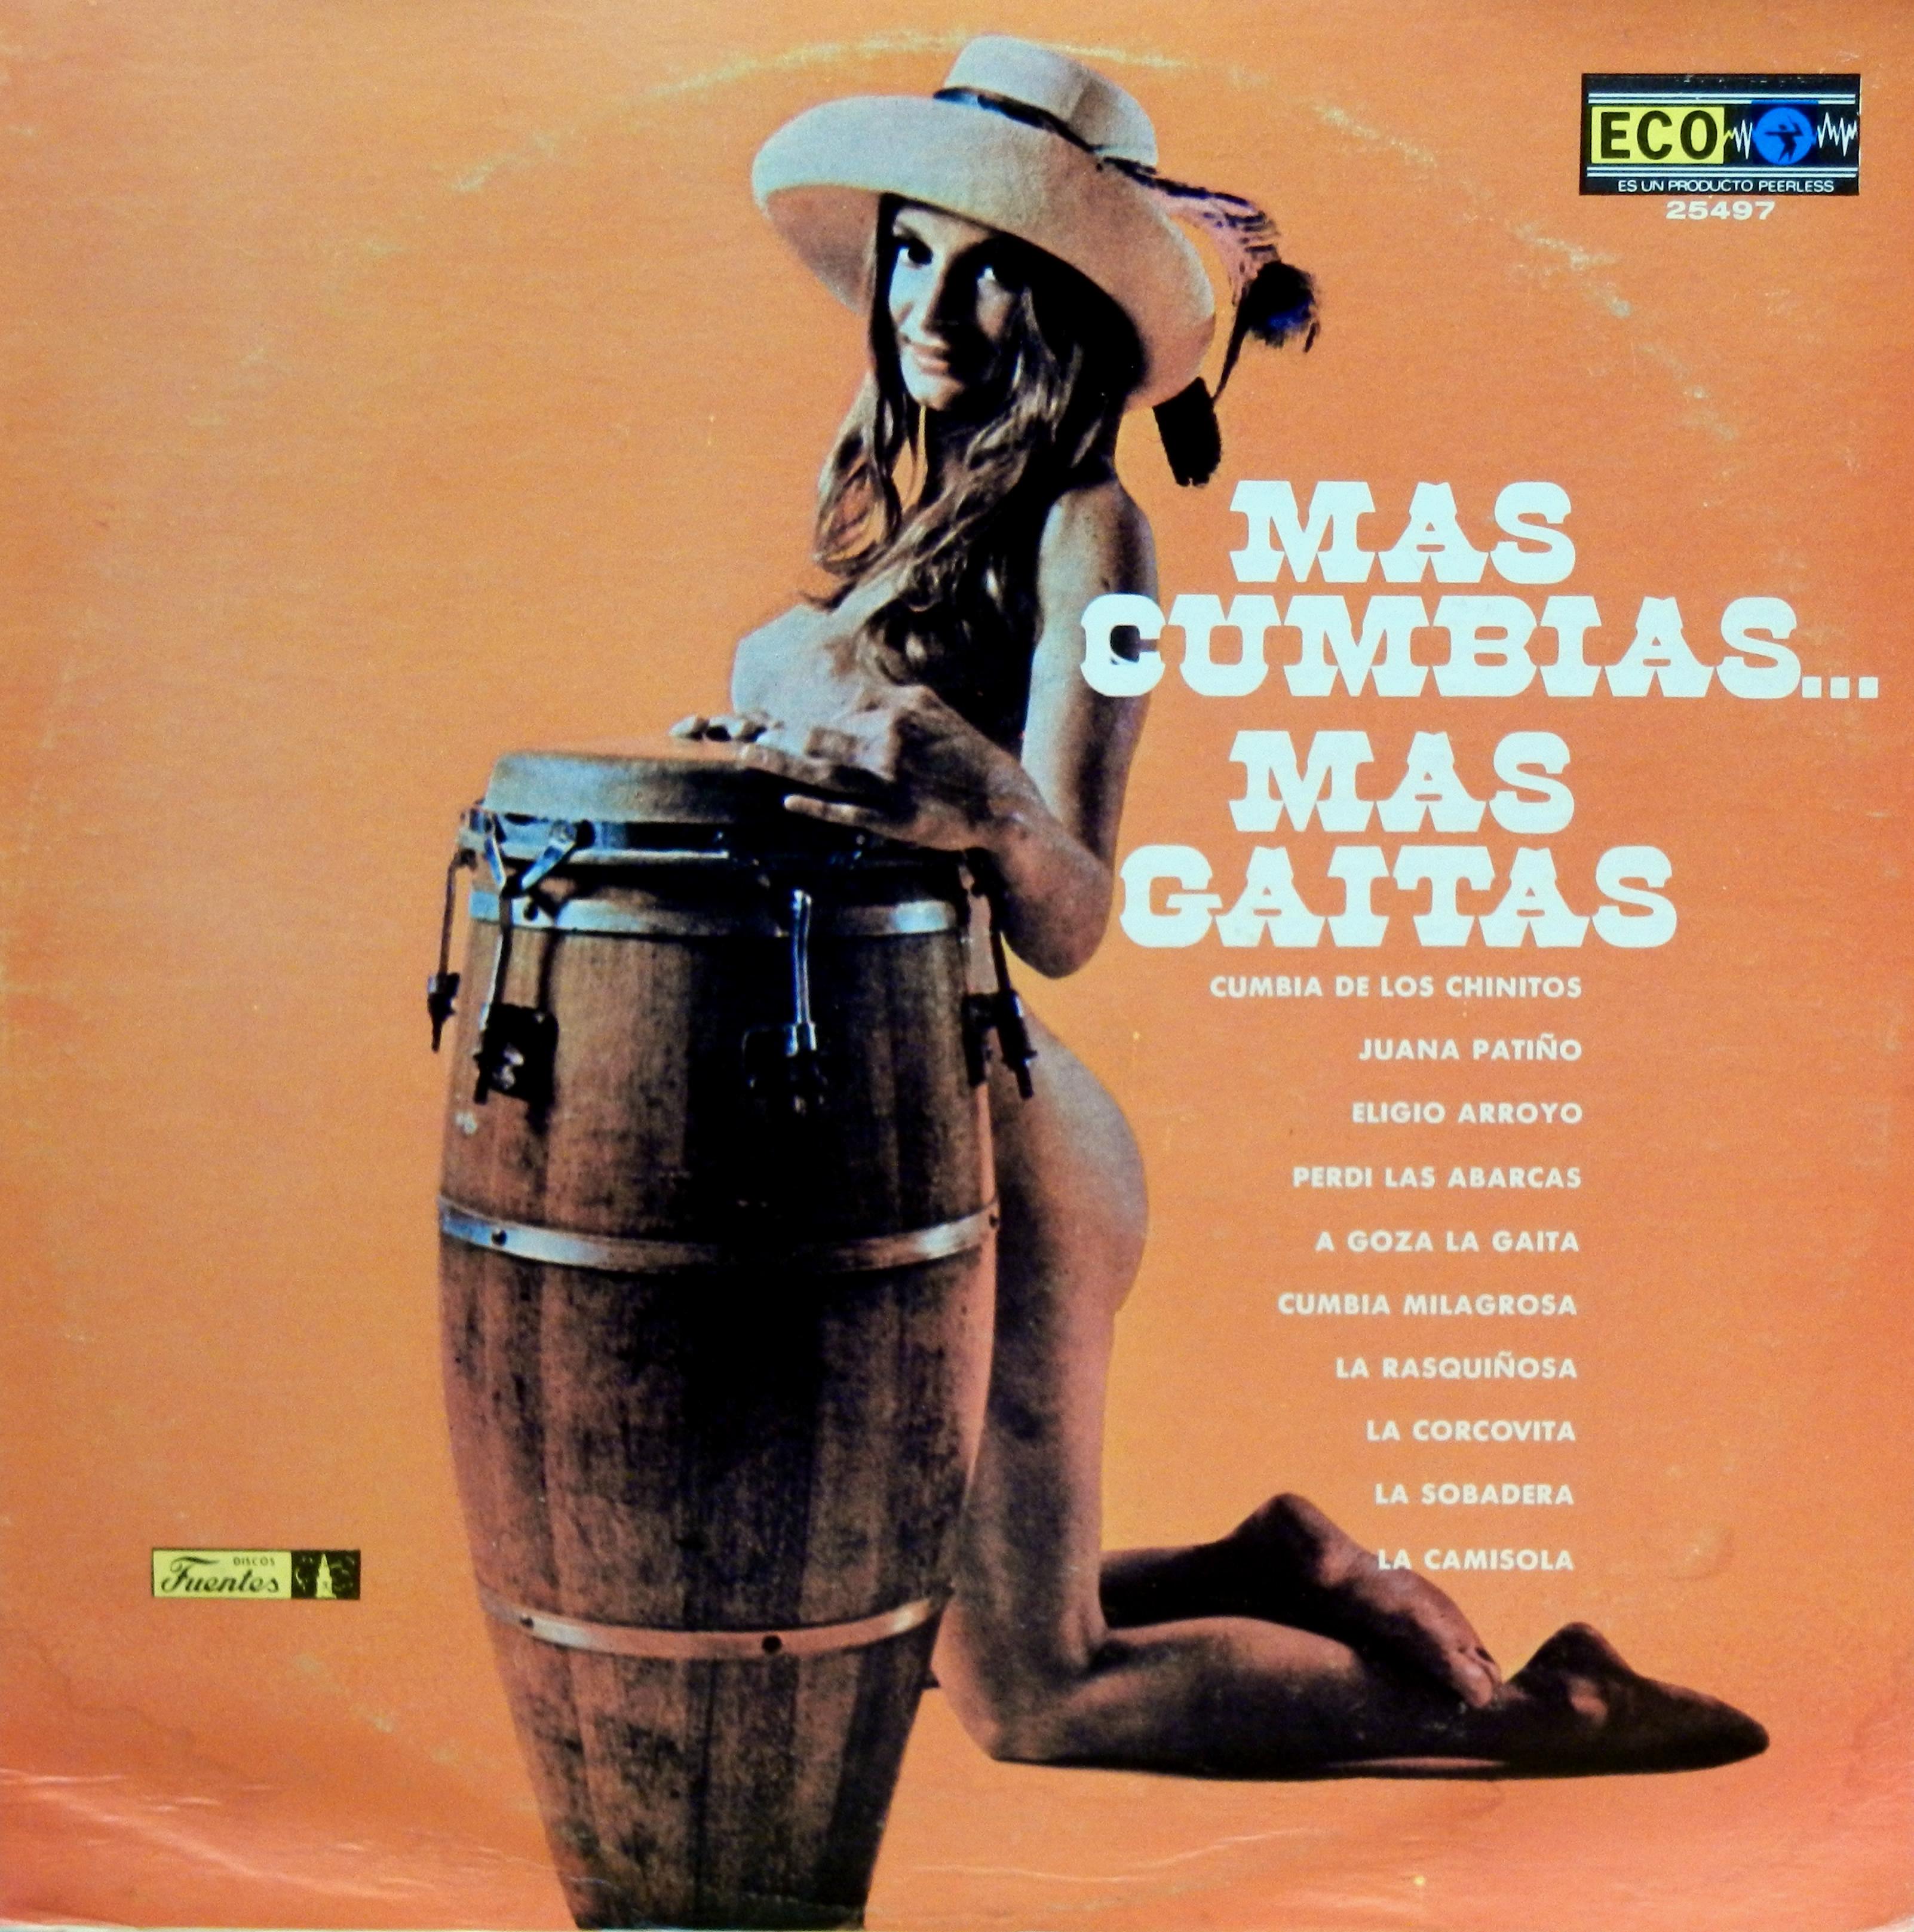 Mas Cumbias…Mas Gaitas – Various ArtistsECO / Discos Fuentes